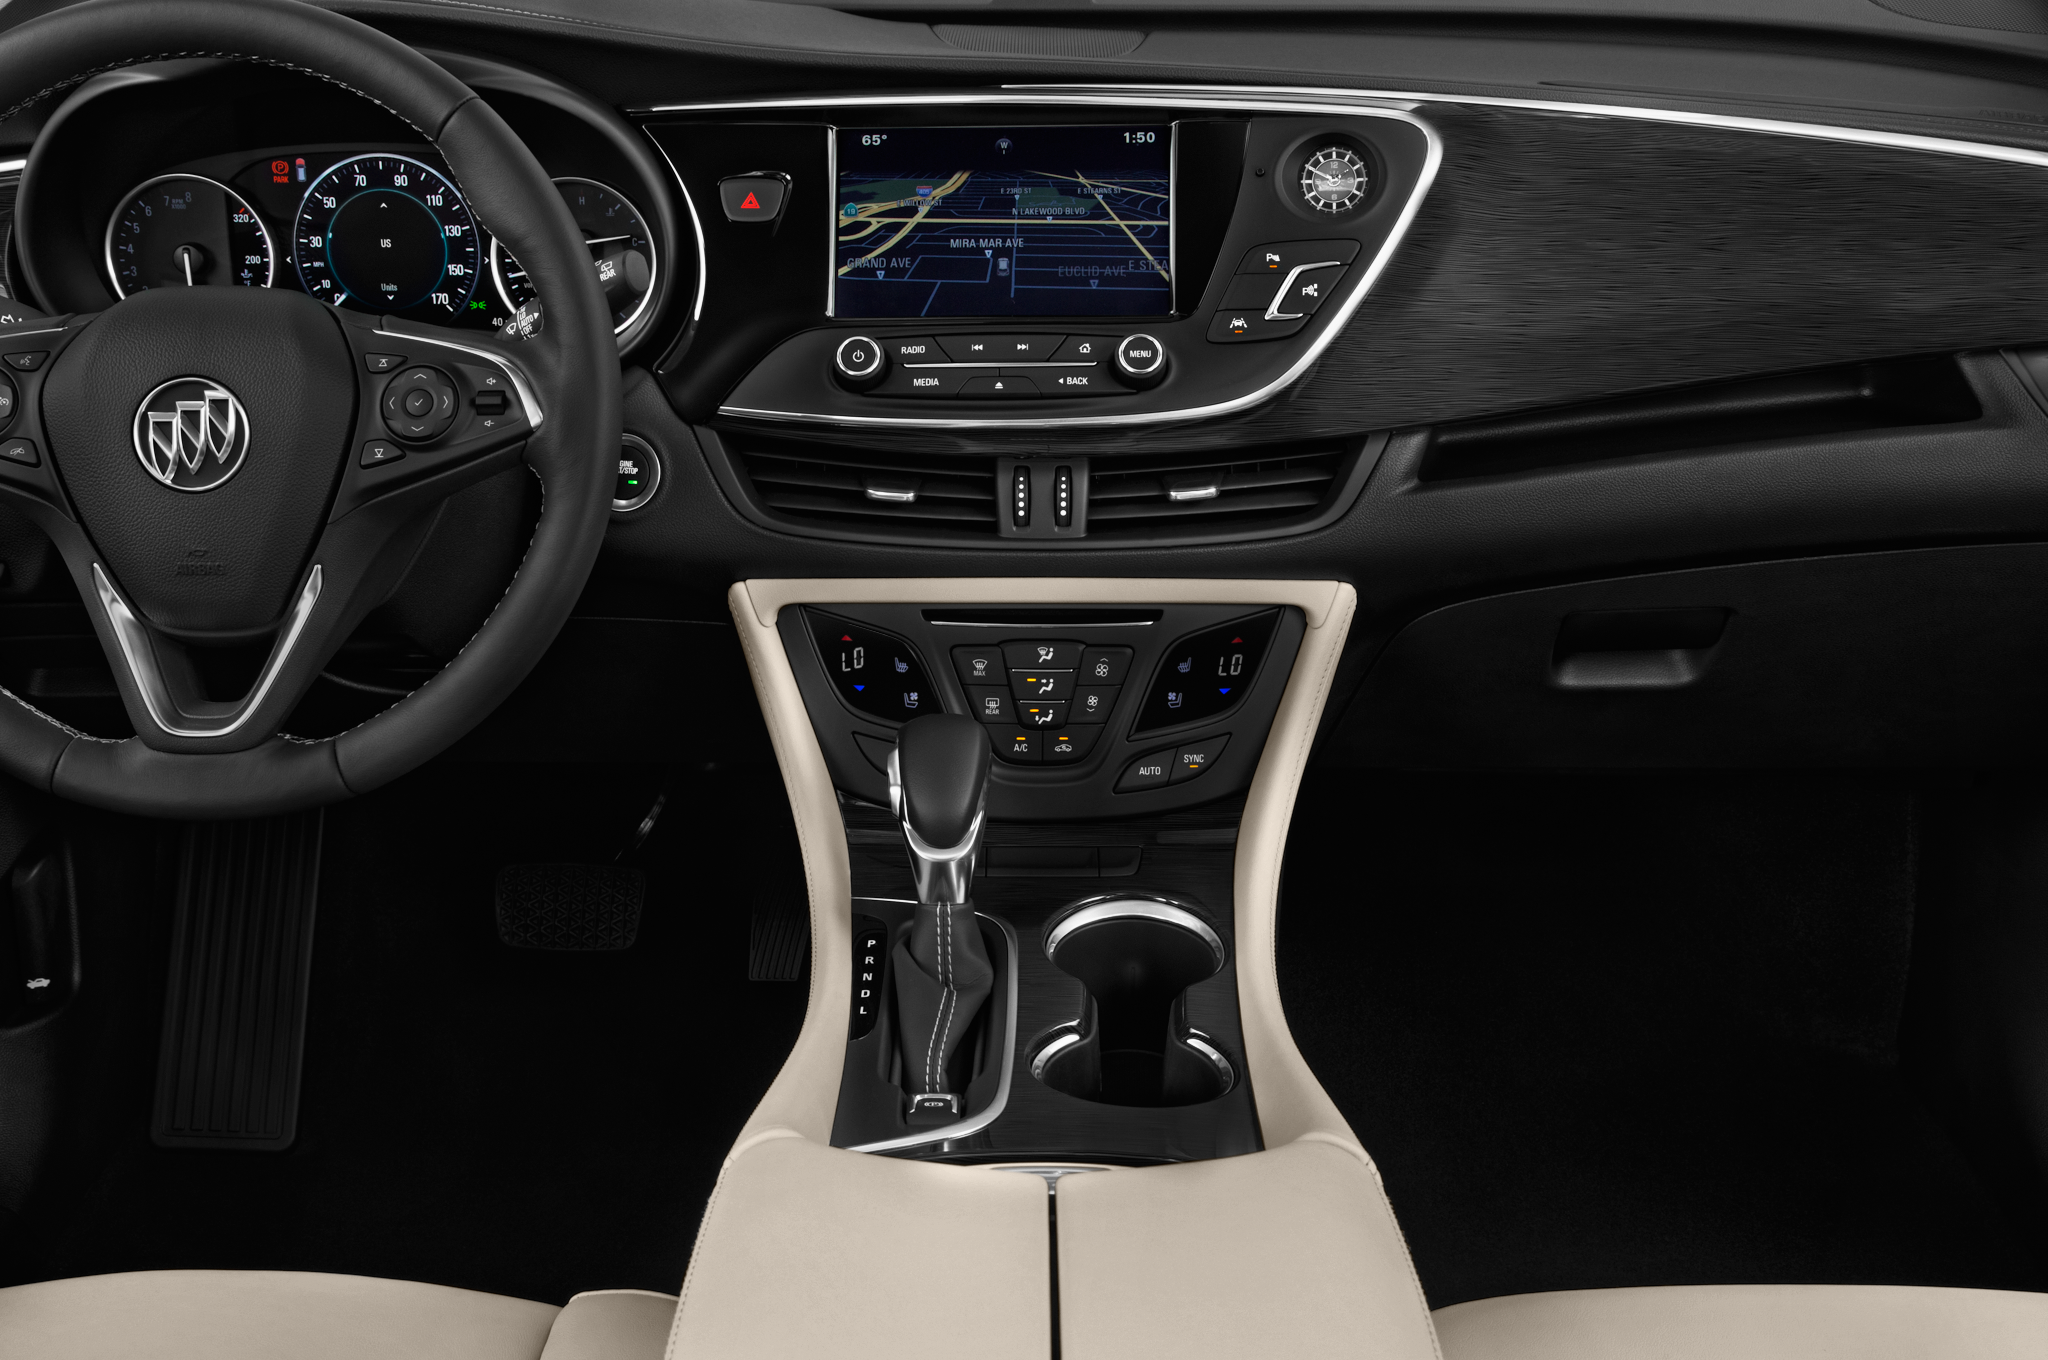 First Drive: 2019 Buick Envision Premium II | Automobile Magazine